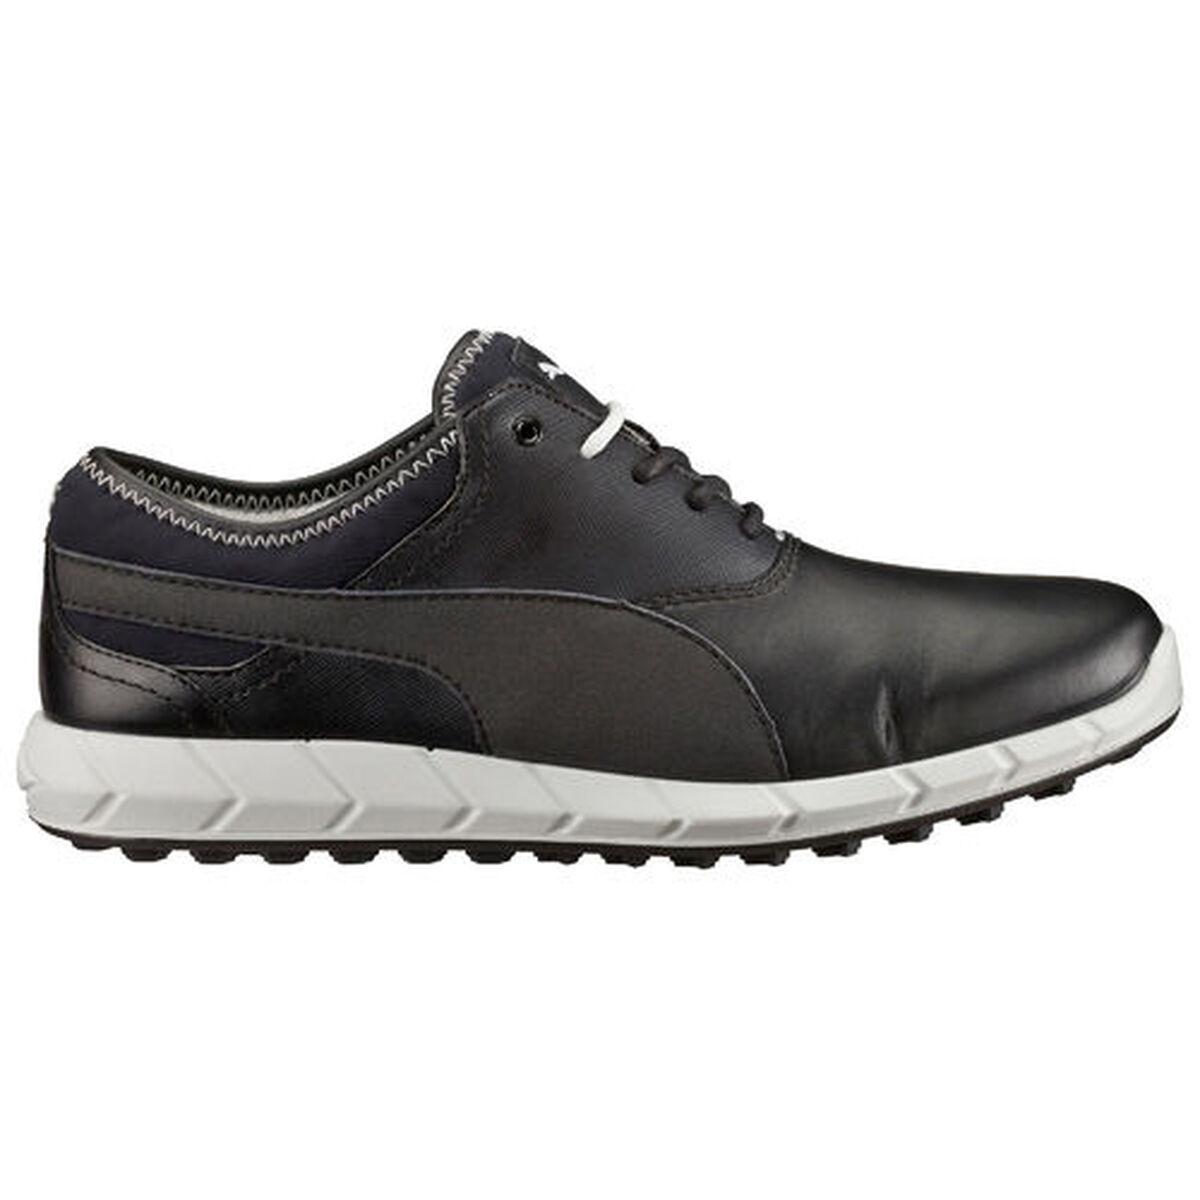 sale retailer 83a6d ad960 Puma IGNITE Spikeless Men's Golf Shoe- Black